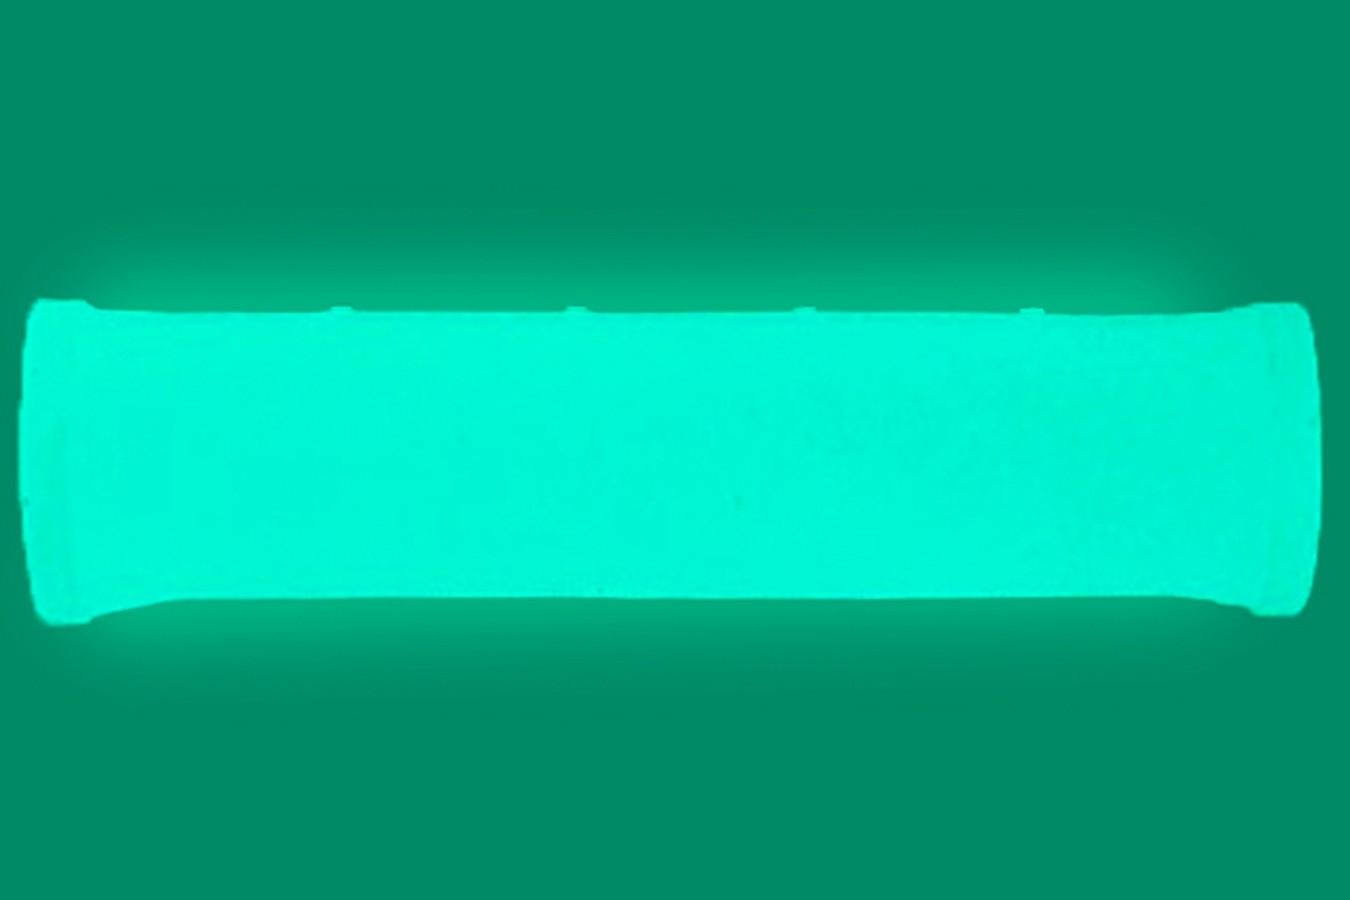 Manopla MTB Transparente Fluorescente (Brilha no Escuro) - Elleven